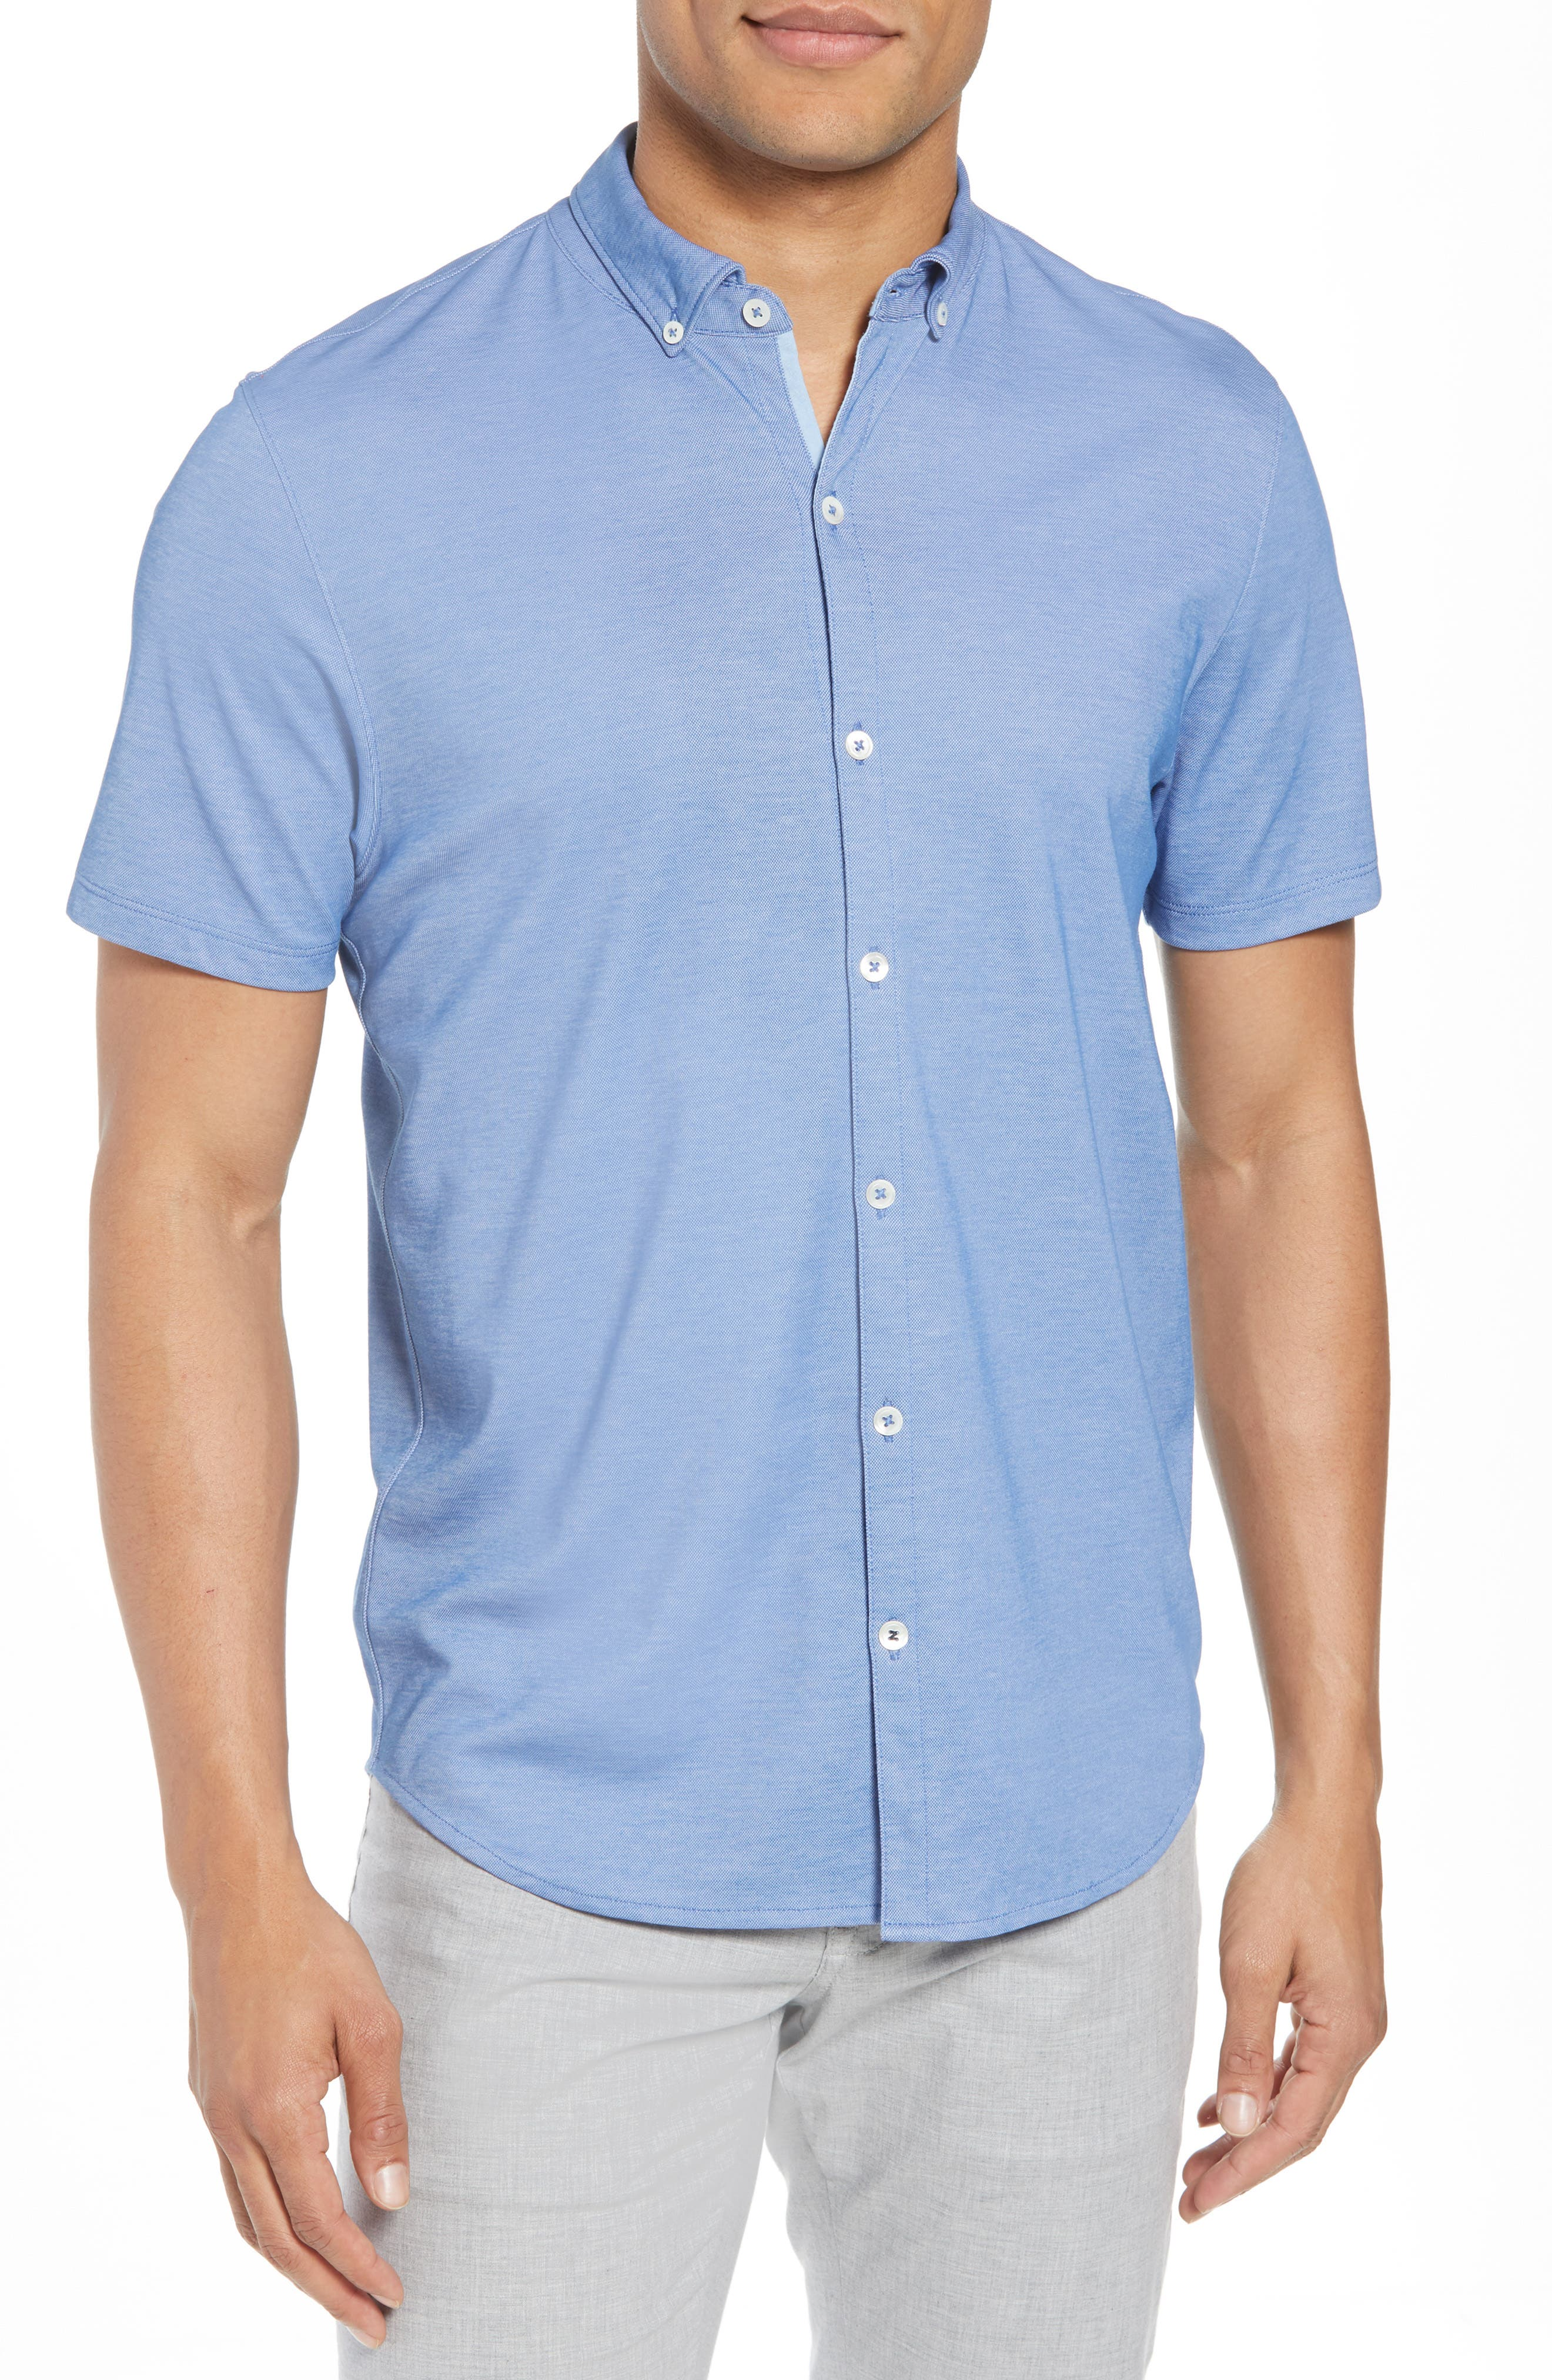 Caruth Piqué Sport Shirt,                             Main thumbnail 1, color,                             Azure